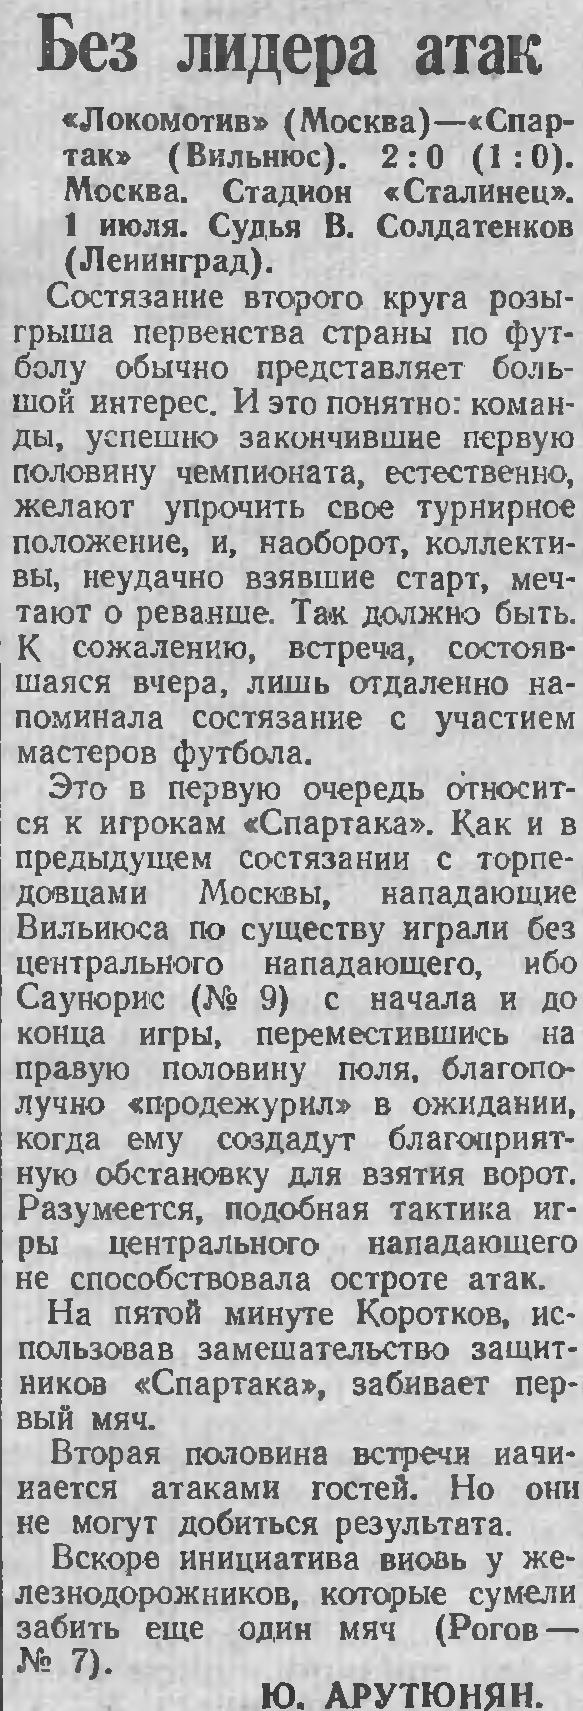 Локомотив (Москва) - Спартак (Вильнюс) 2:0